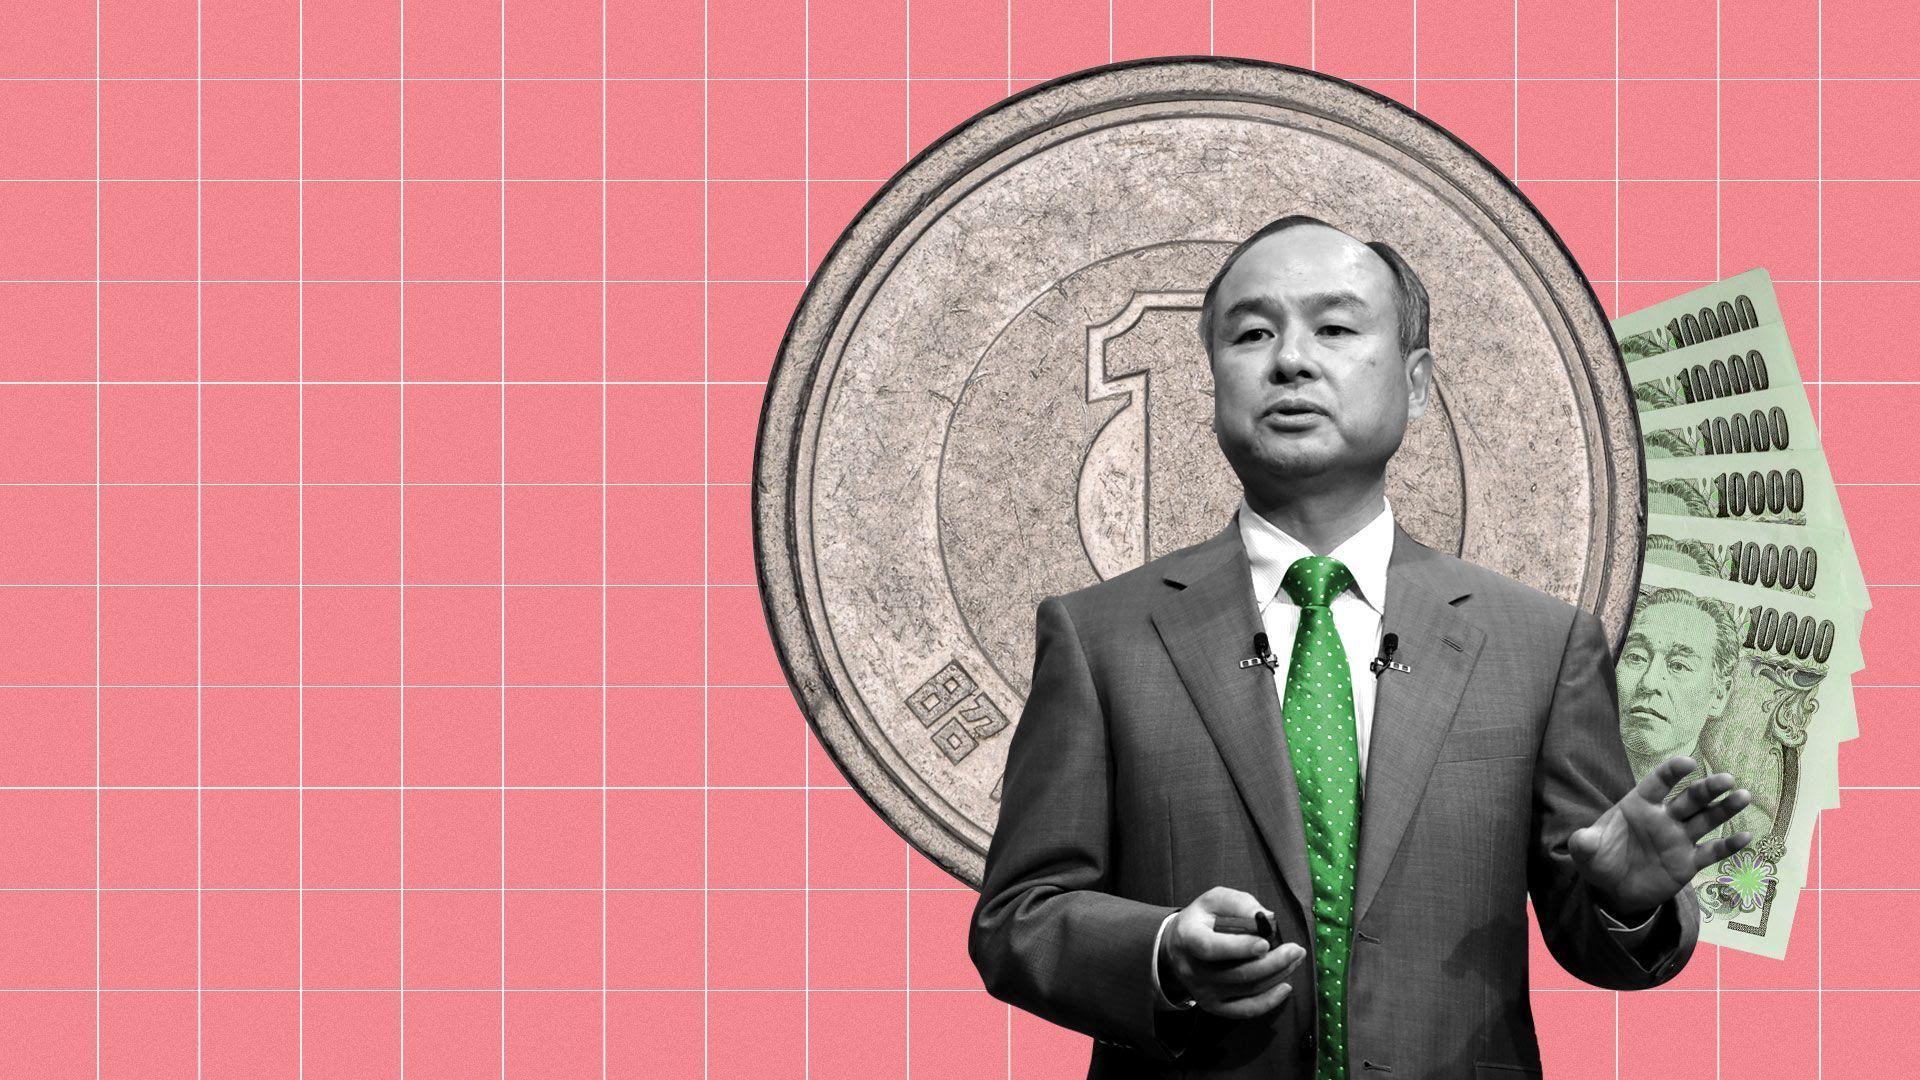 Illustration of SoftBank chairman Masayoshi Son in front of money